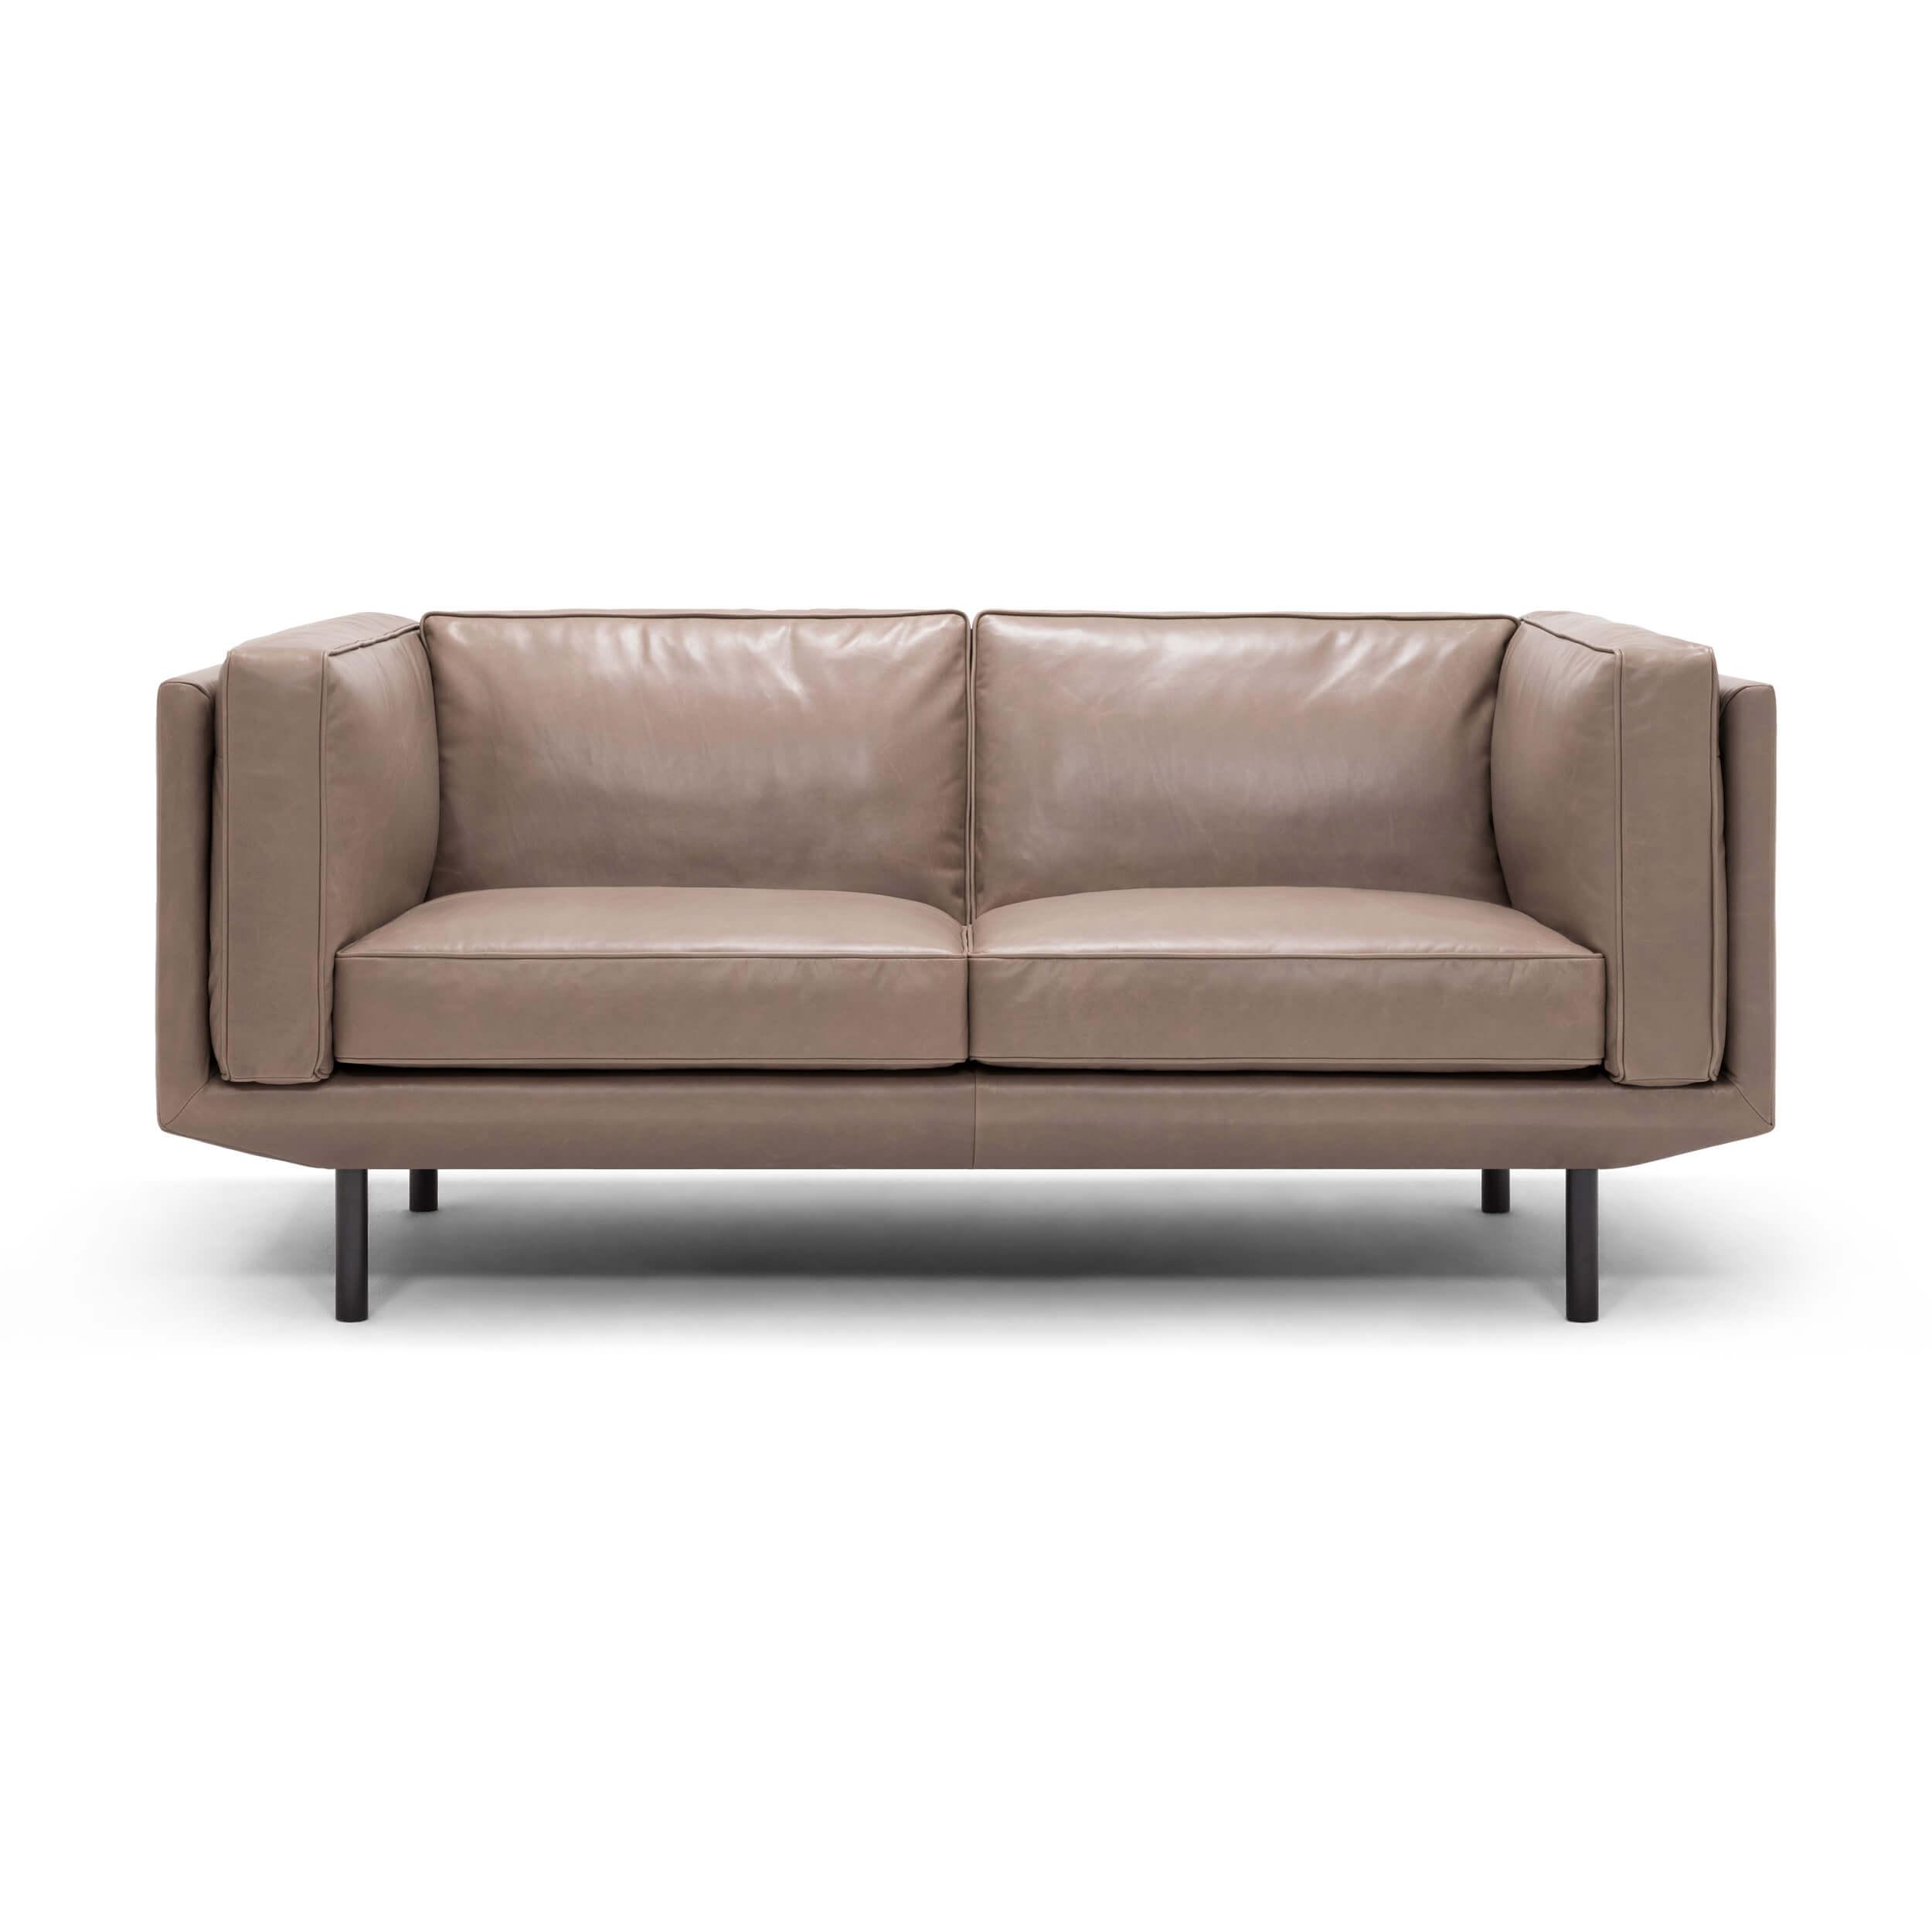 Plateau Loveseat - Leather